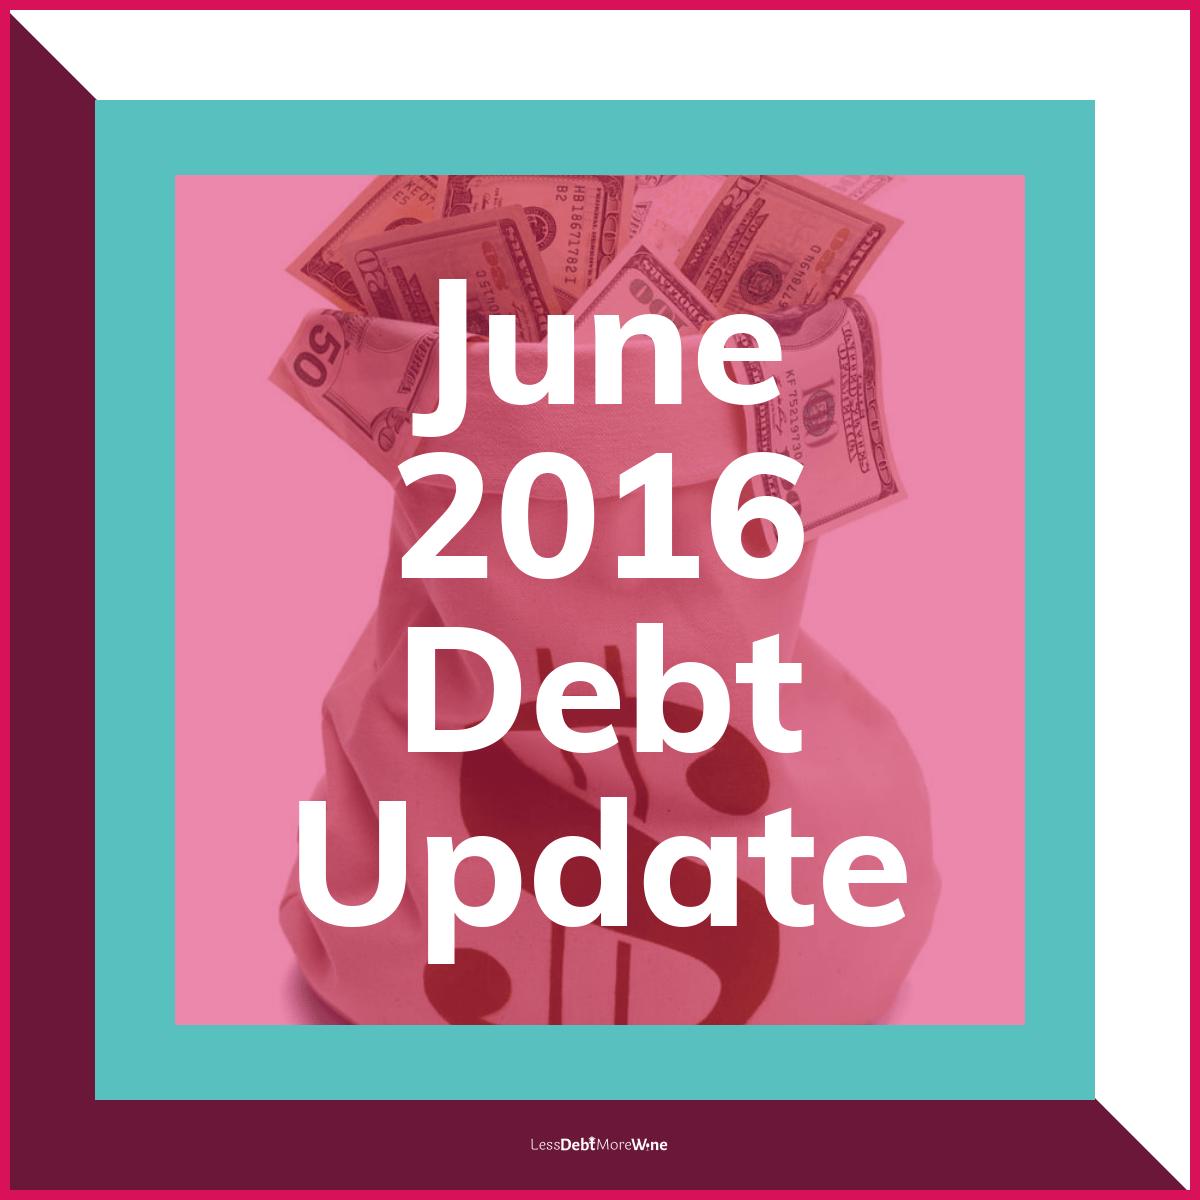 June 2016 debt update, debt payoff progress